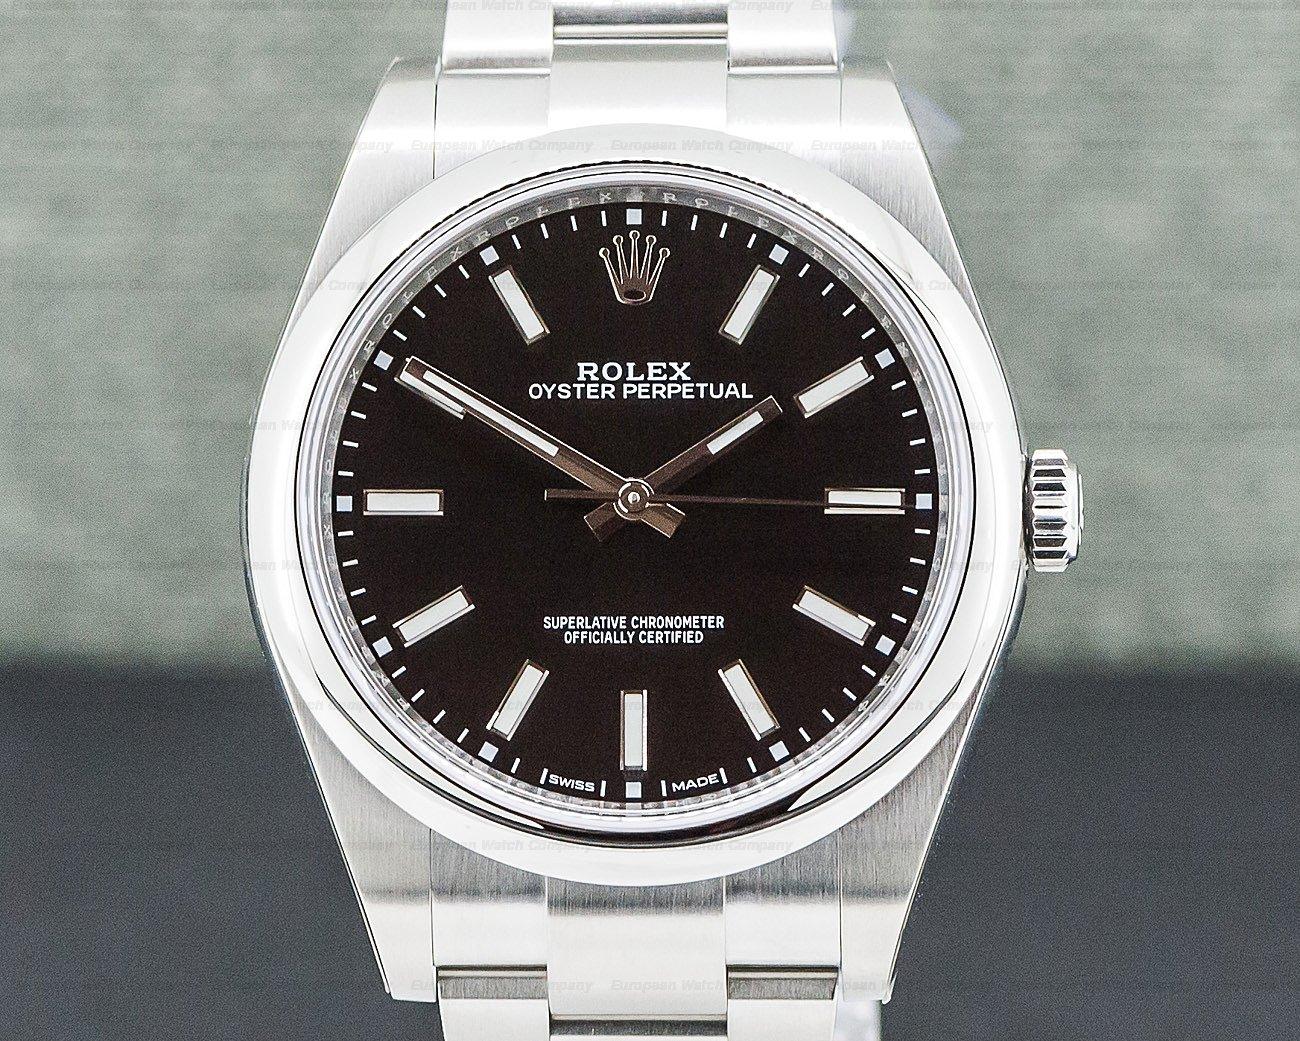 Rolex 114300 Oyster Perpetual SS Black Stick Dial UNWORN